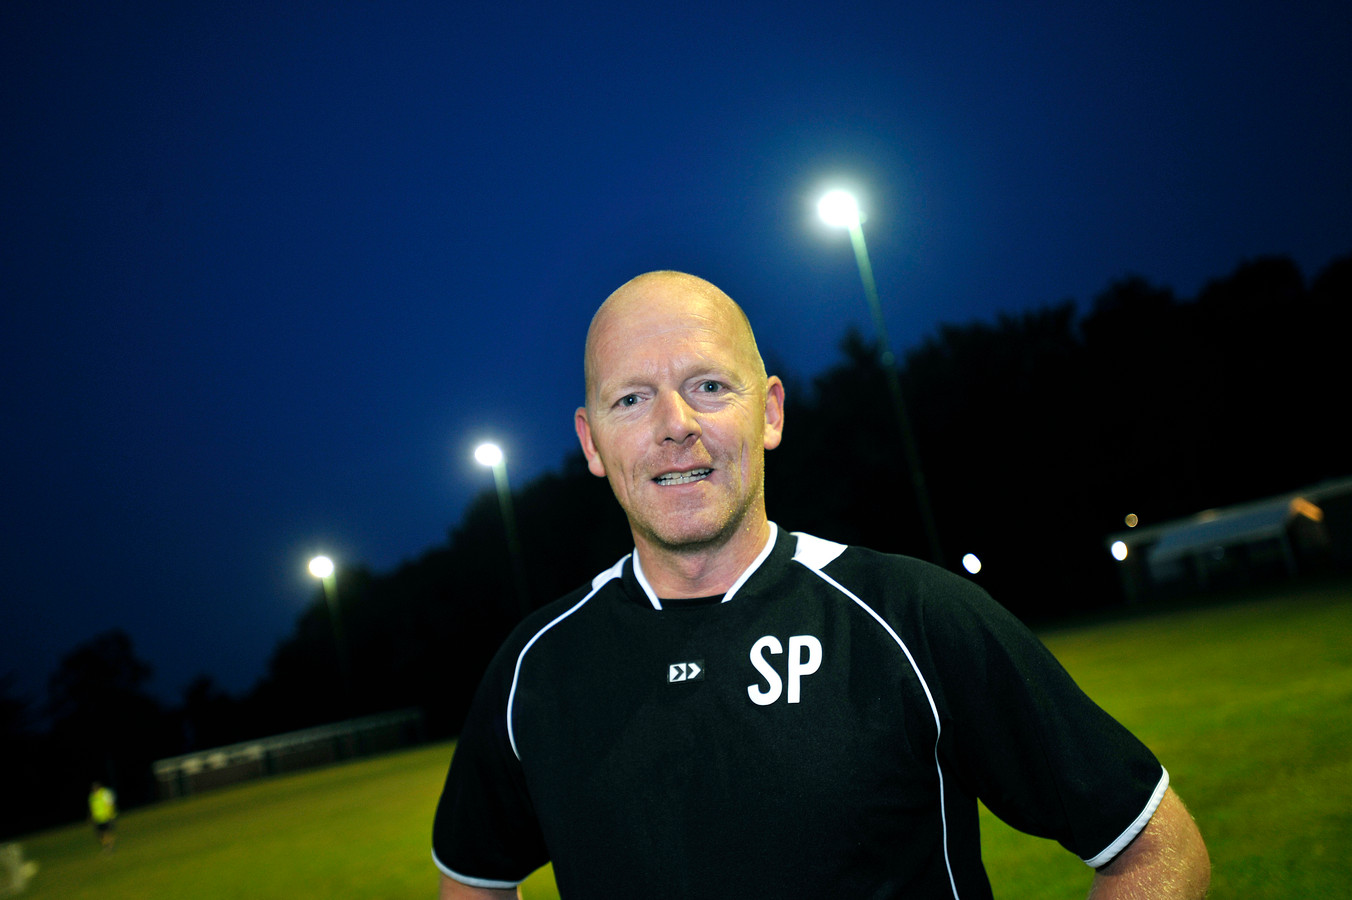 Voetbalcoach Stephan Panman.